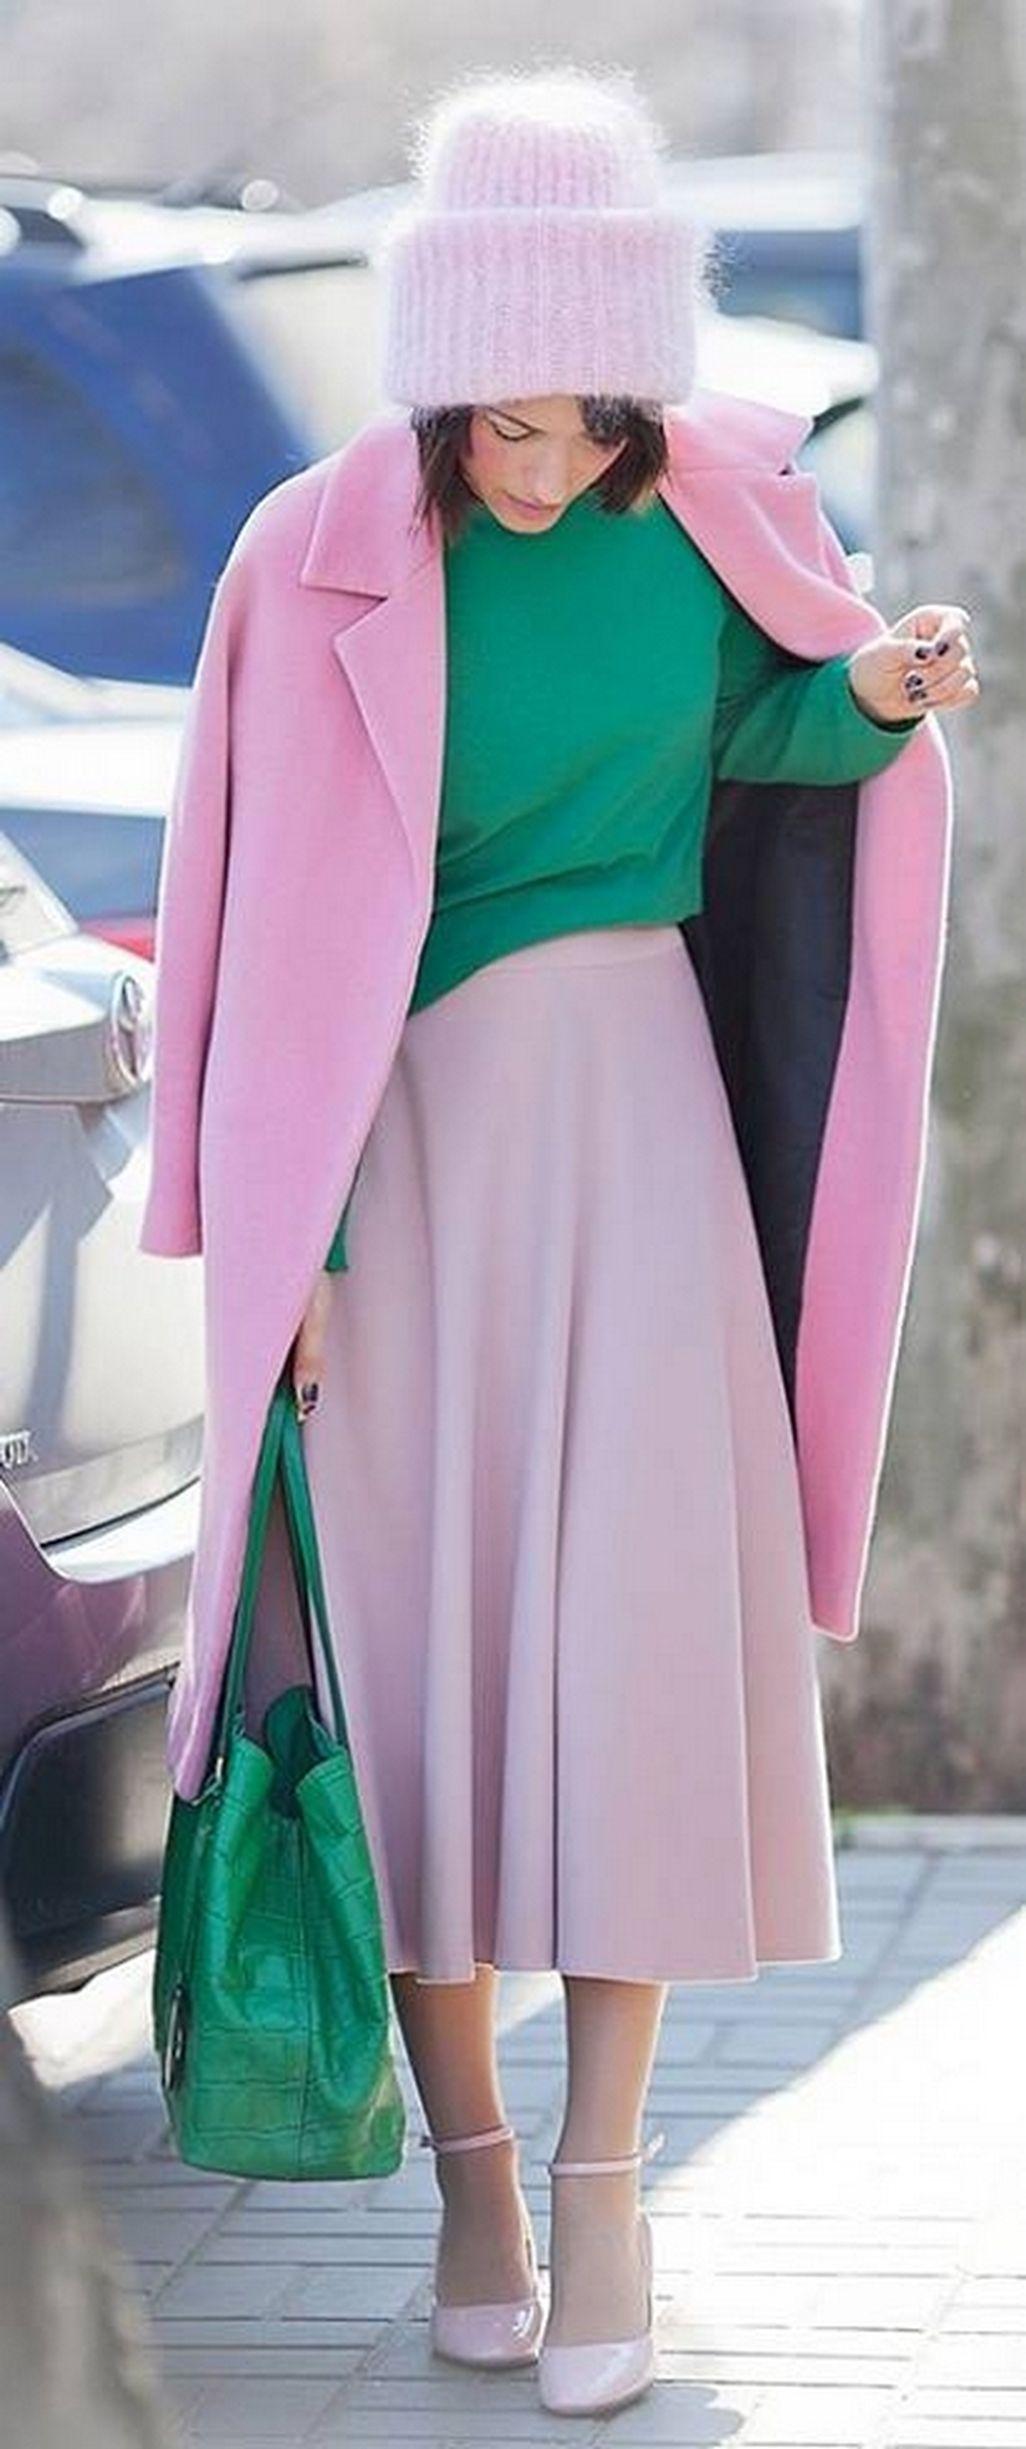 10+ Pink and green dress ideas ideas